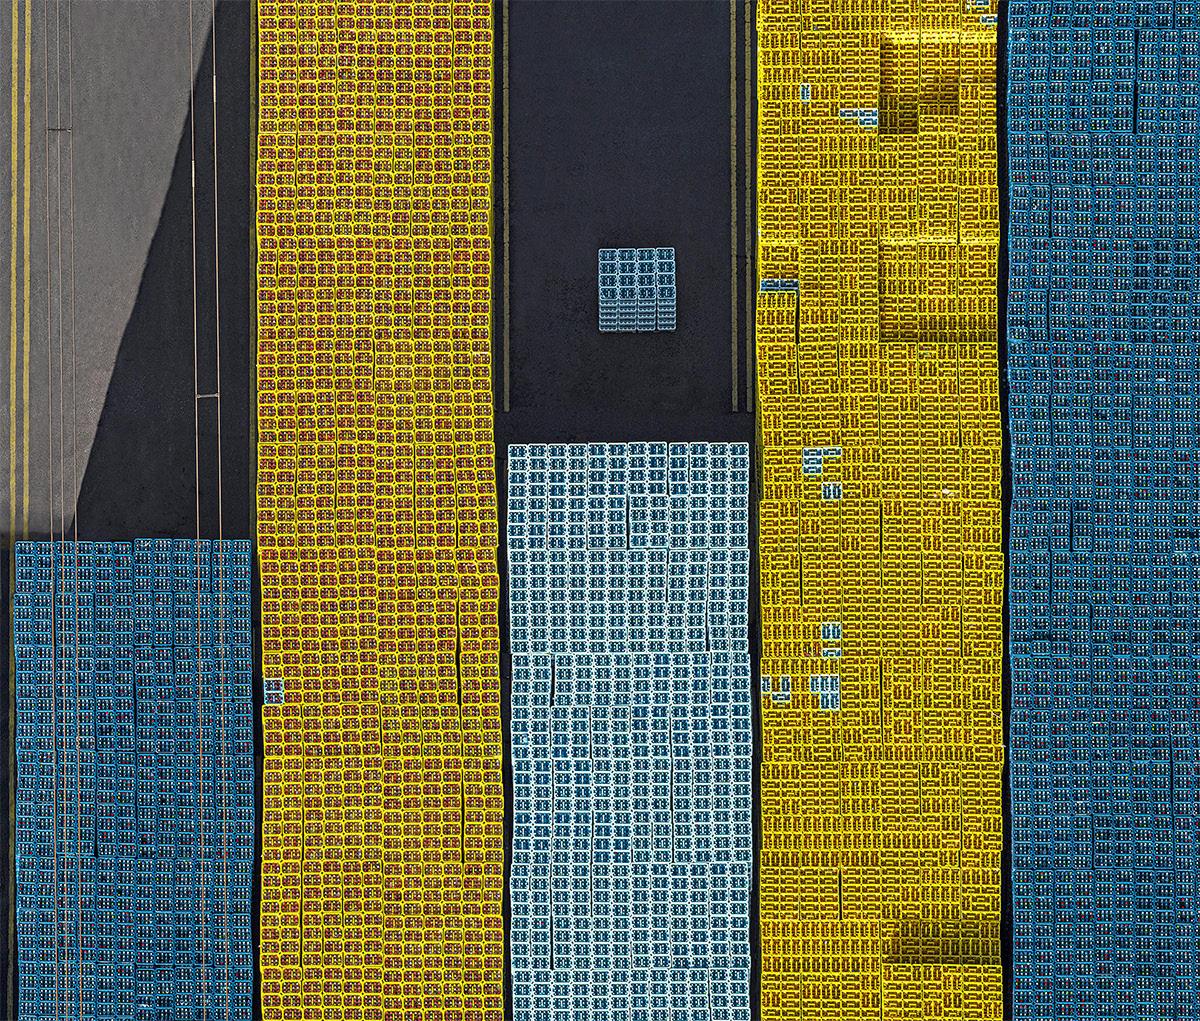 Bernhard Lang crate stacks 5